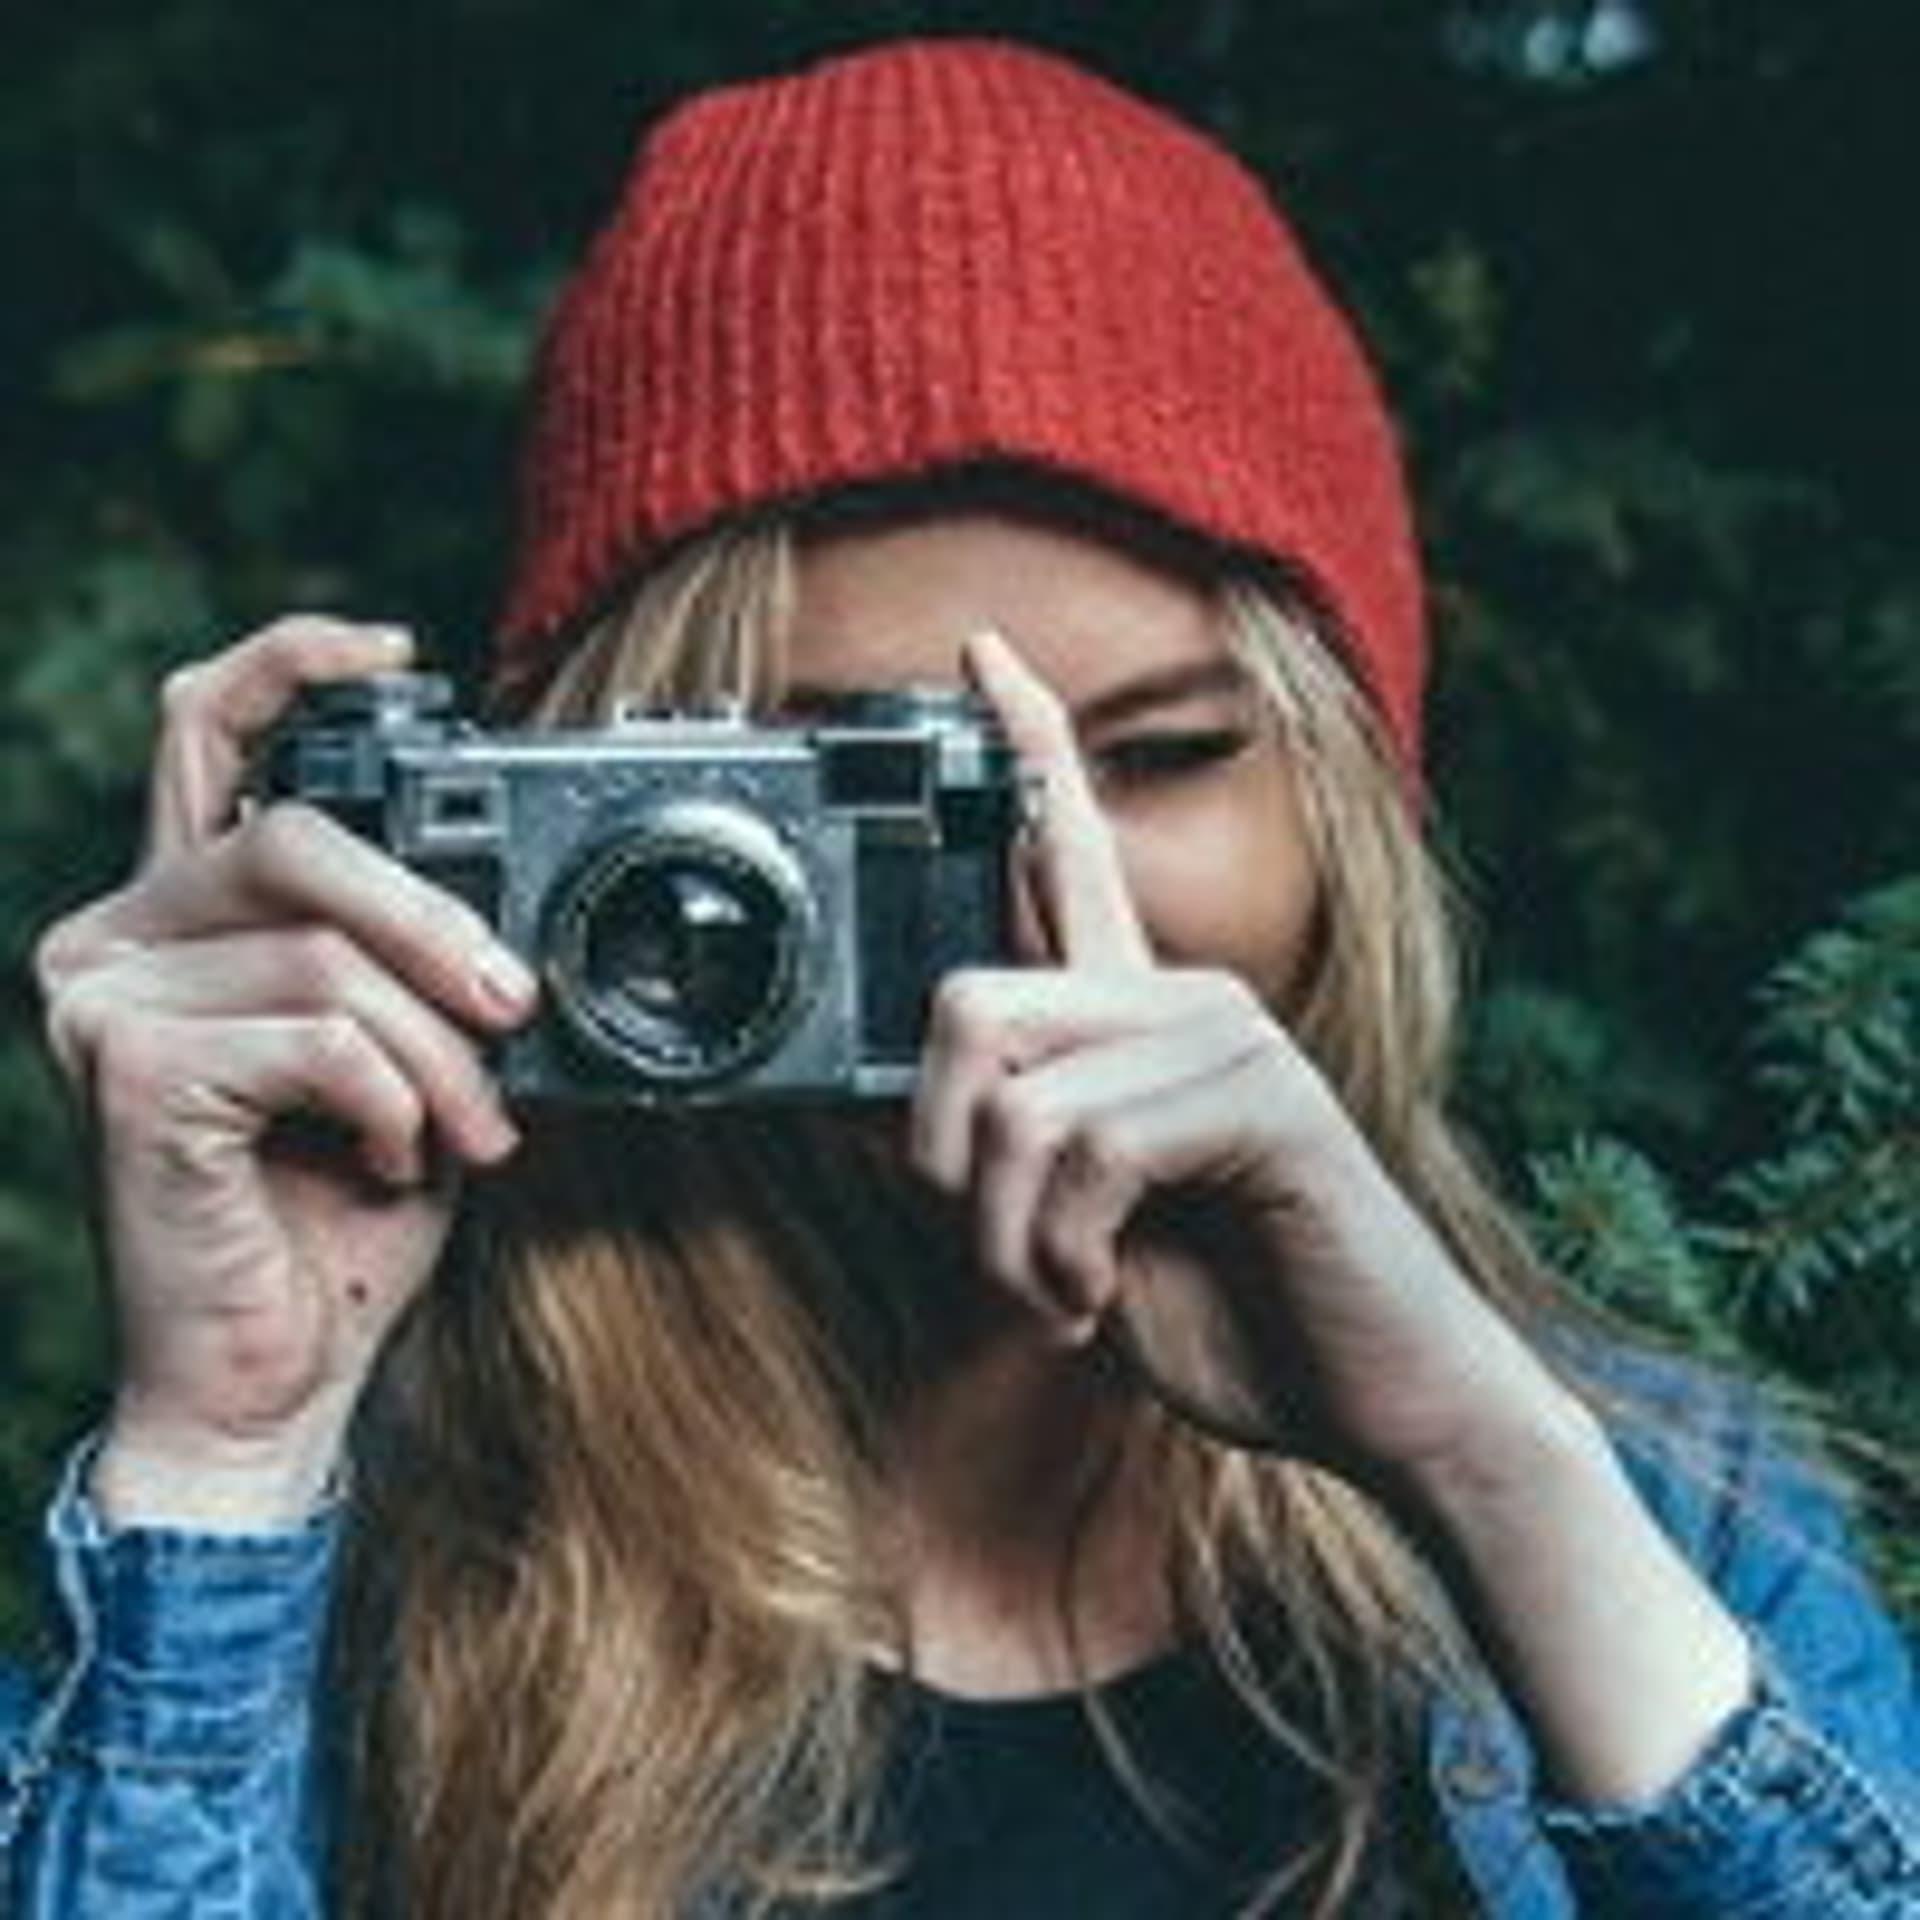 Bloggerin c Pixabay